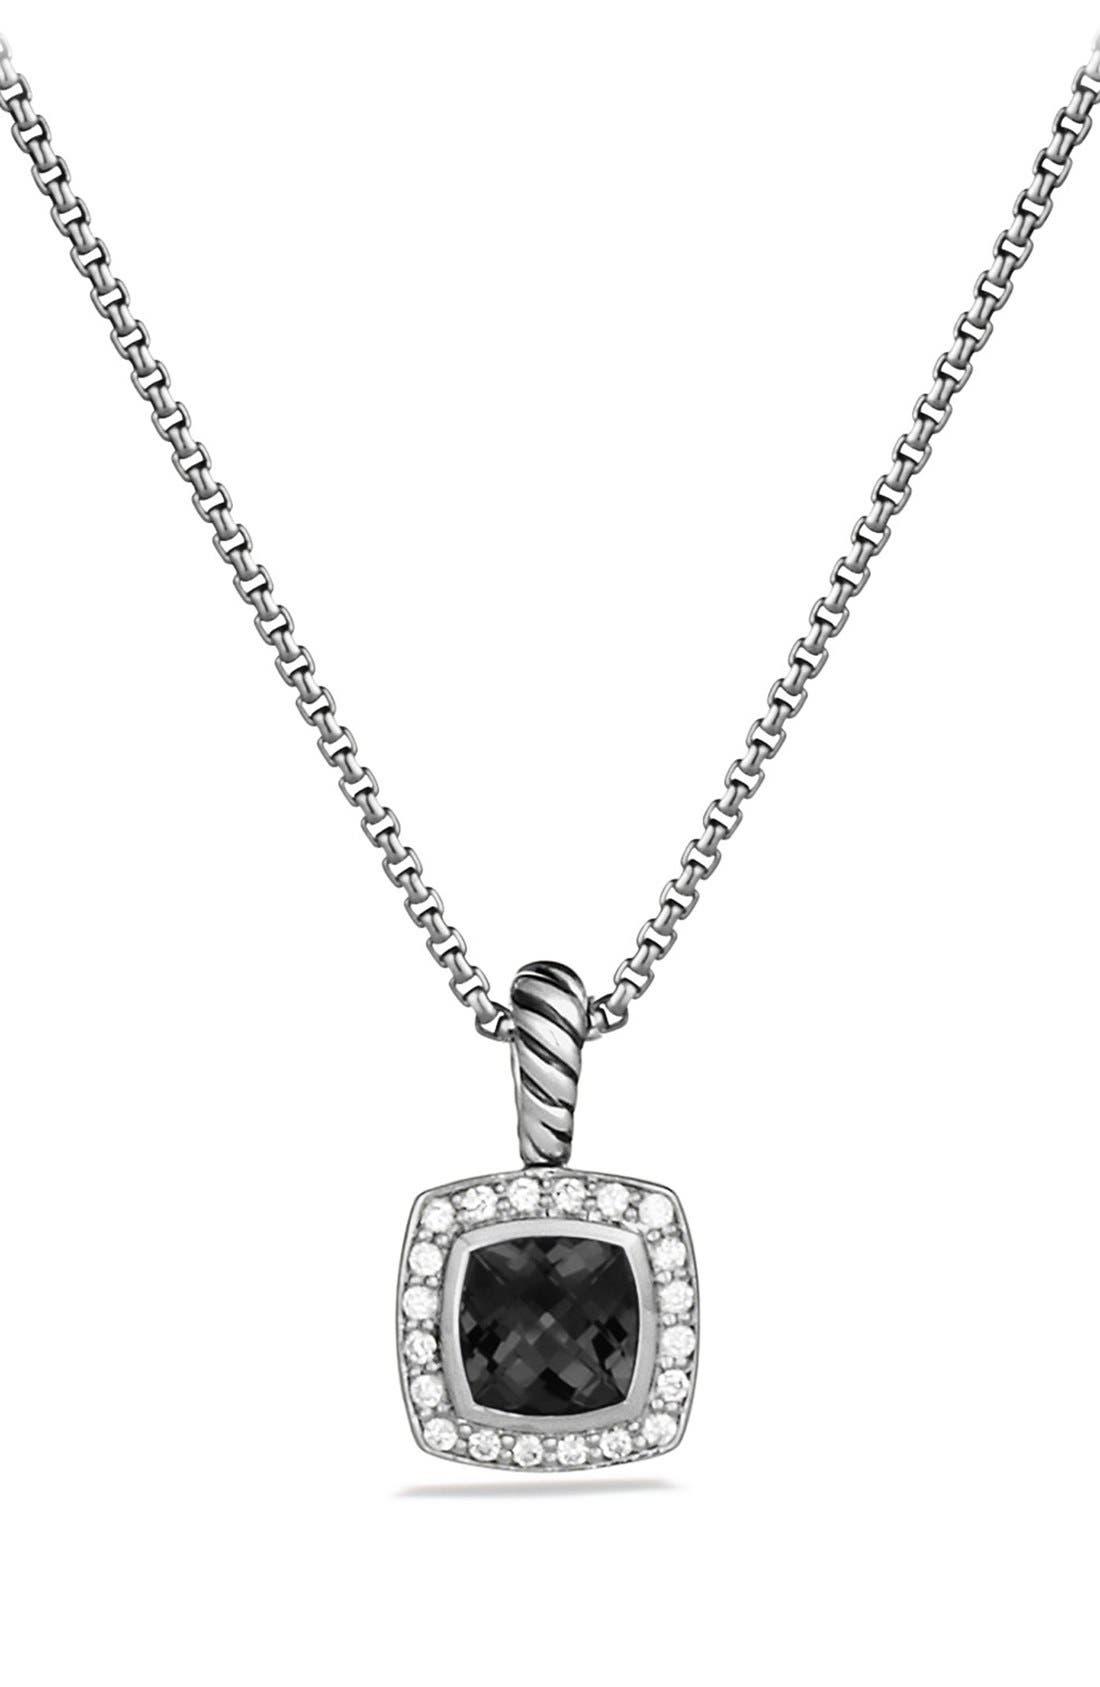 DAVID YURMAN 'Albion' Petite Pendant with Semiprecious Stone & Diamonds on Chain, Main, color, BLACK ONYX